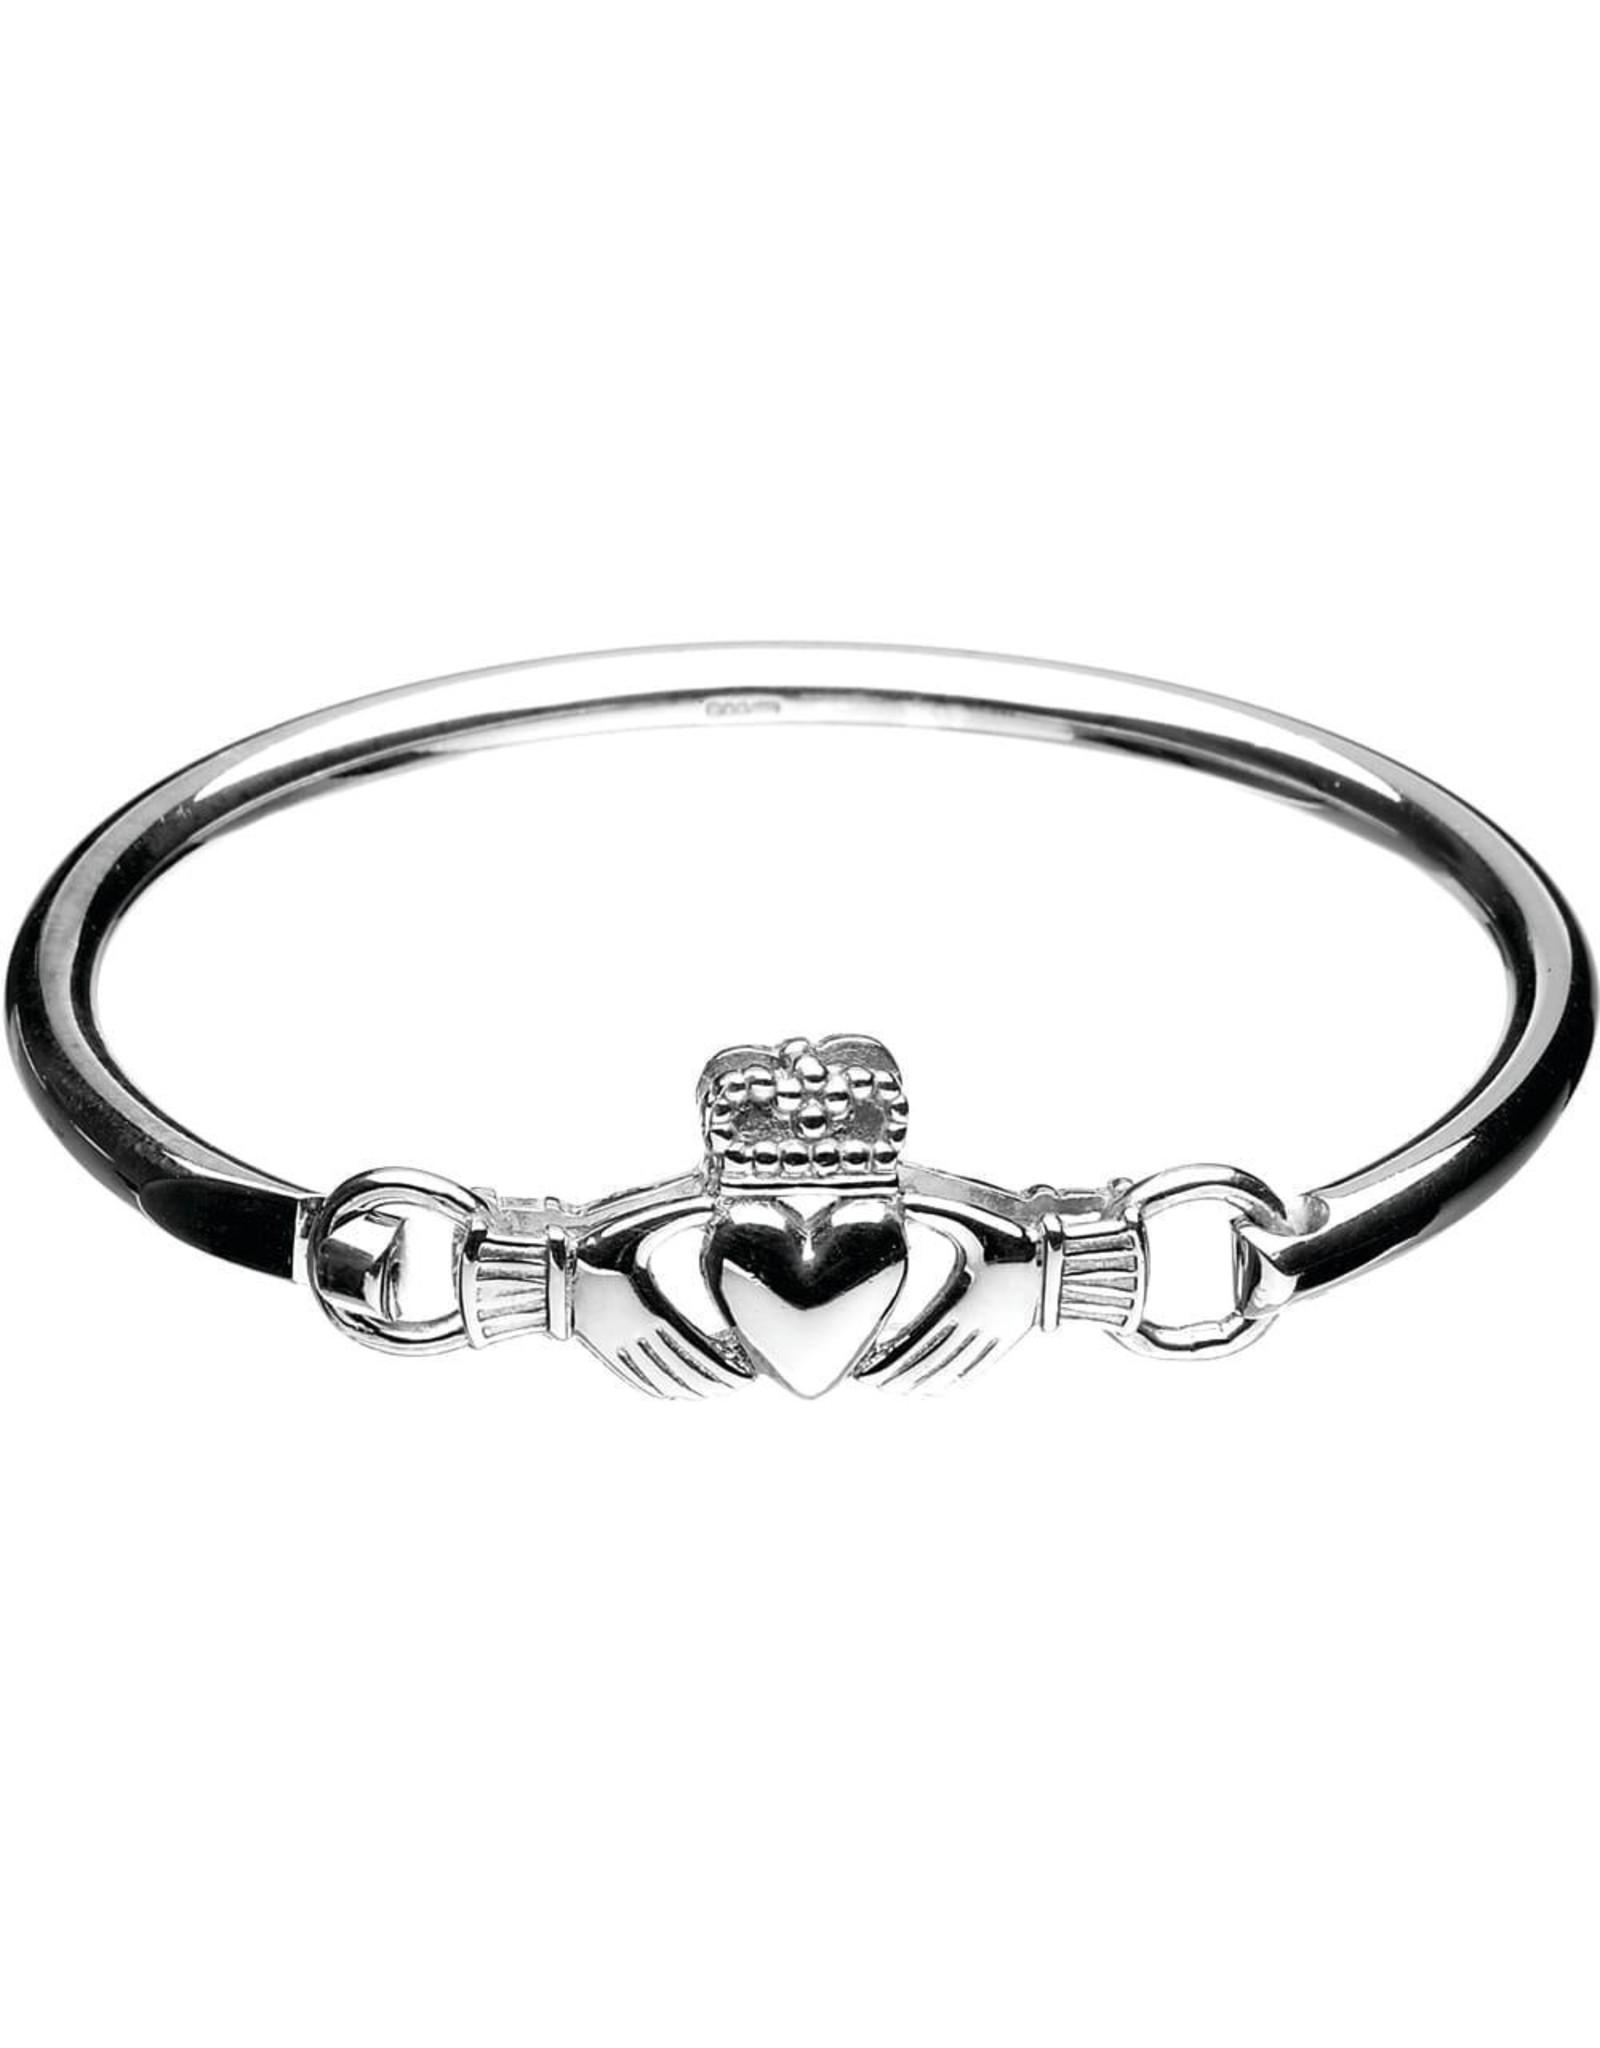 Boru Jewelry Sterling Silver Claddagh Bangle